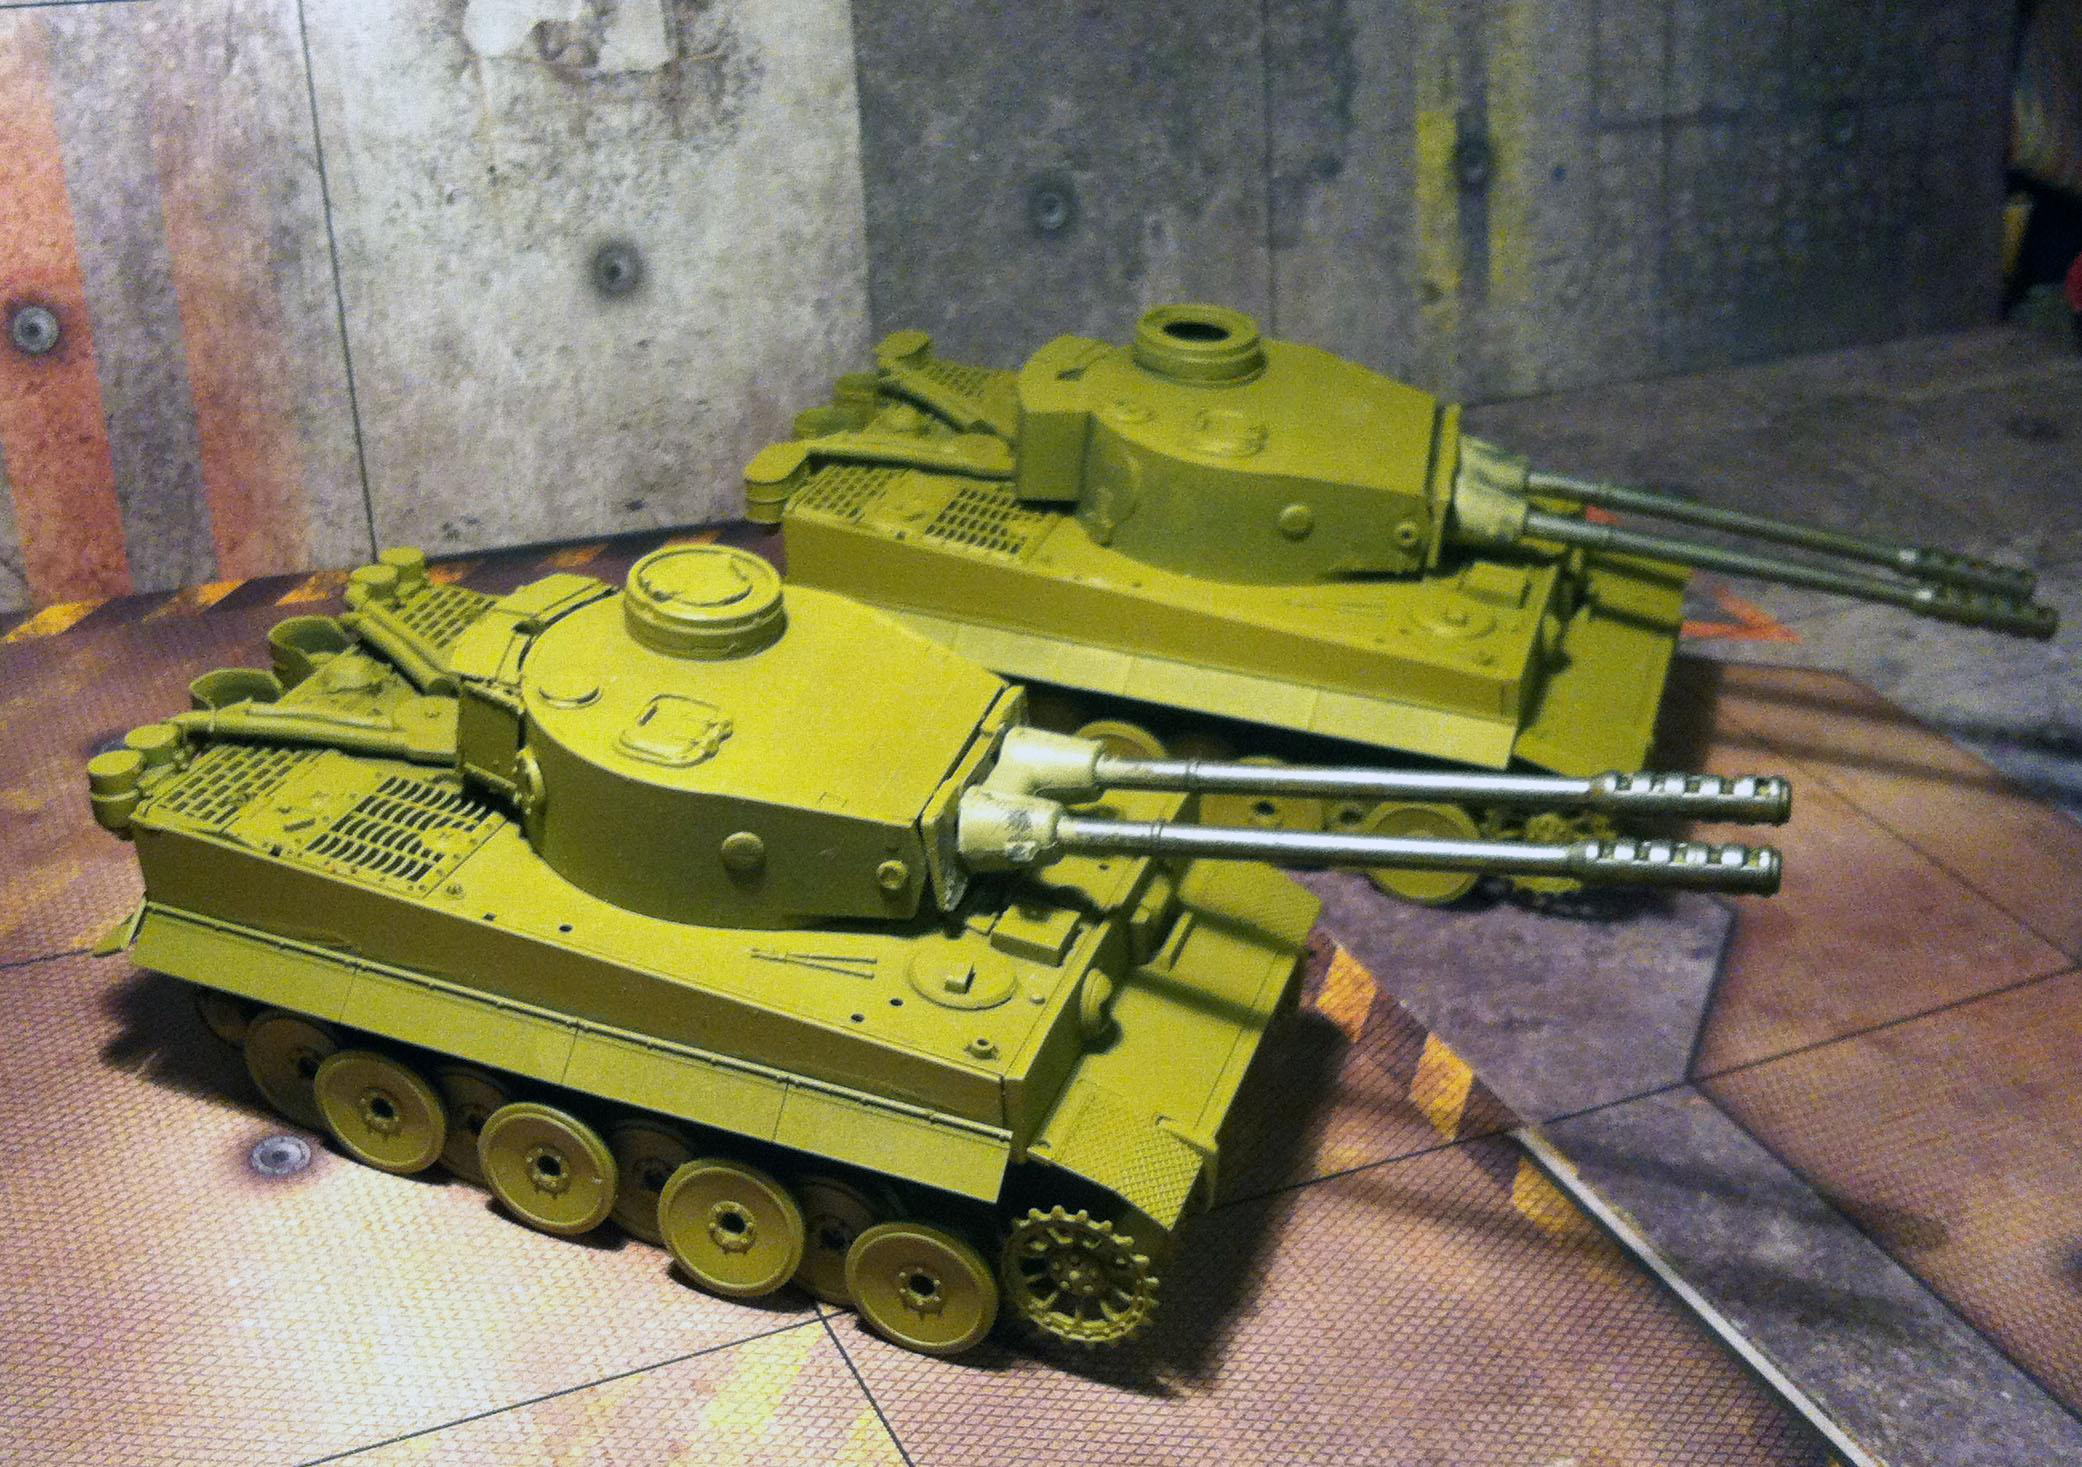 Afrika Korps, Dust, Dust Tactics, Dust Warfare, Ndak, Tamiya, Tiger, Tiger I, Vk, World War 2